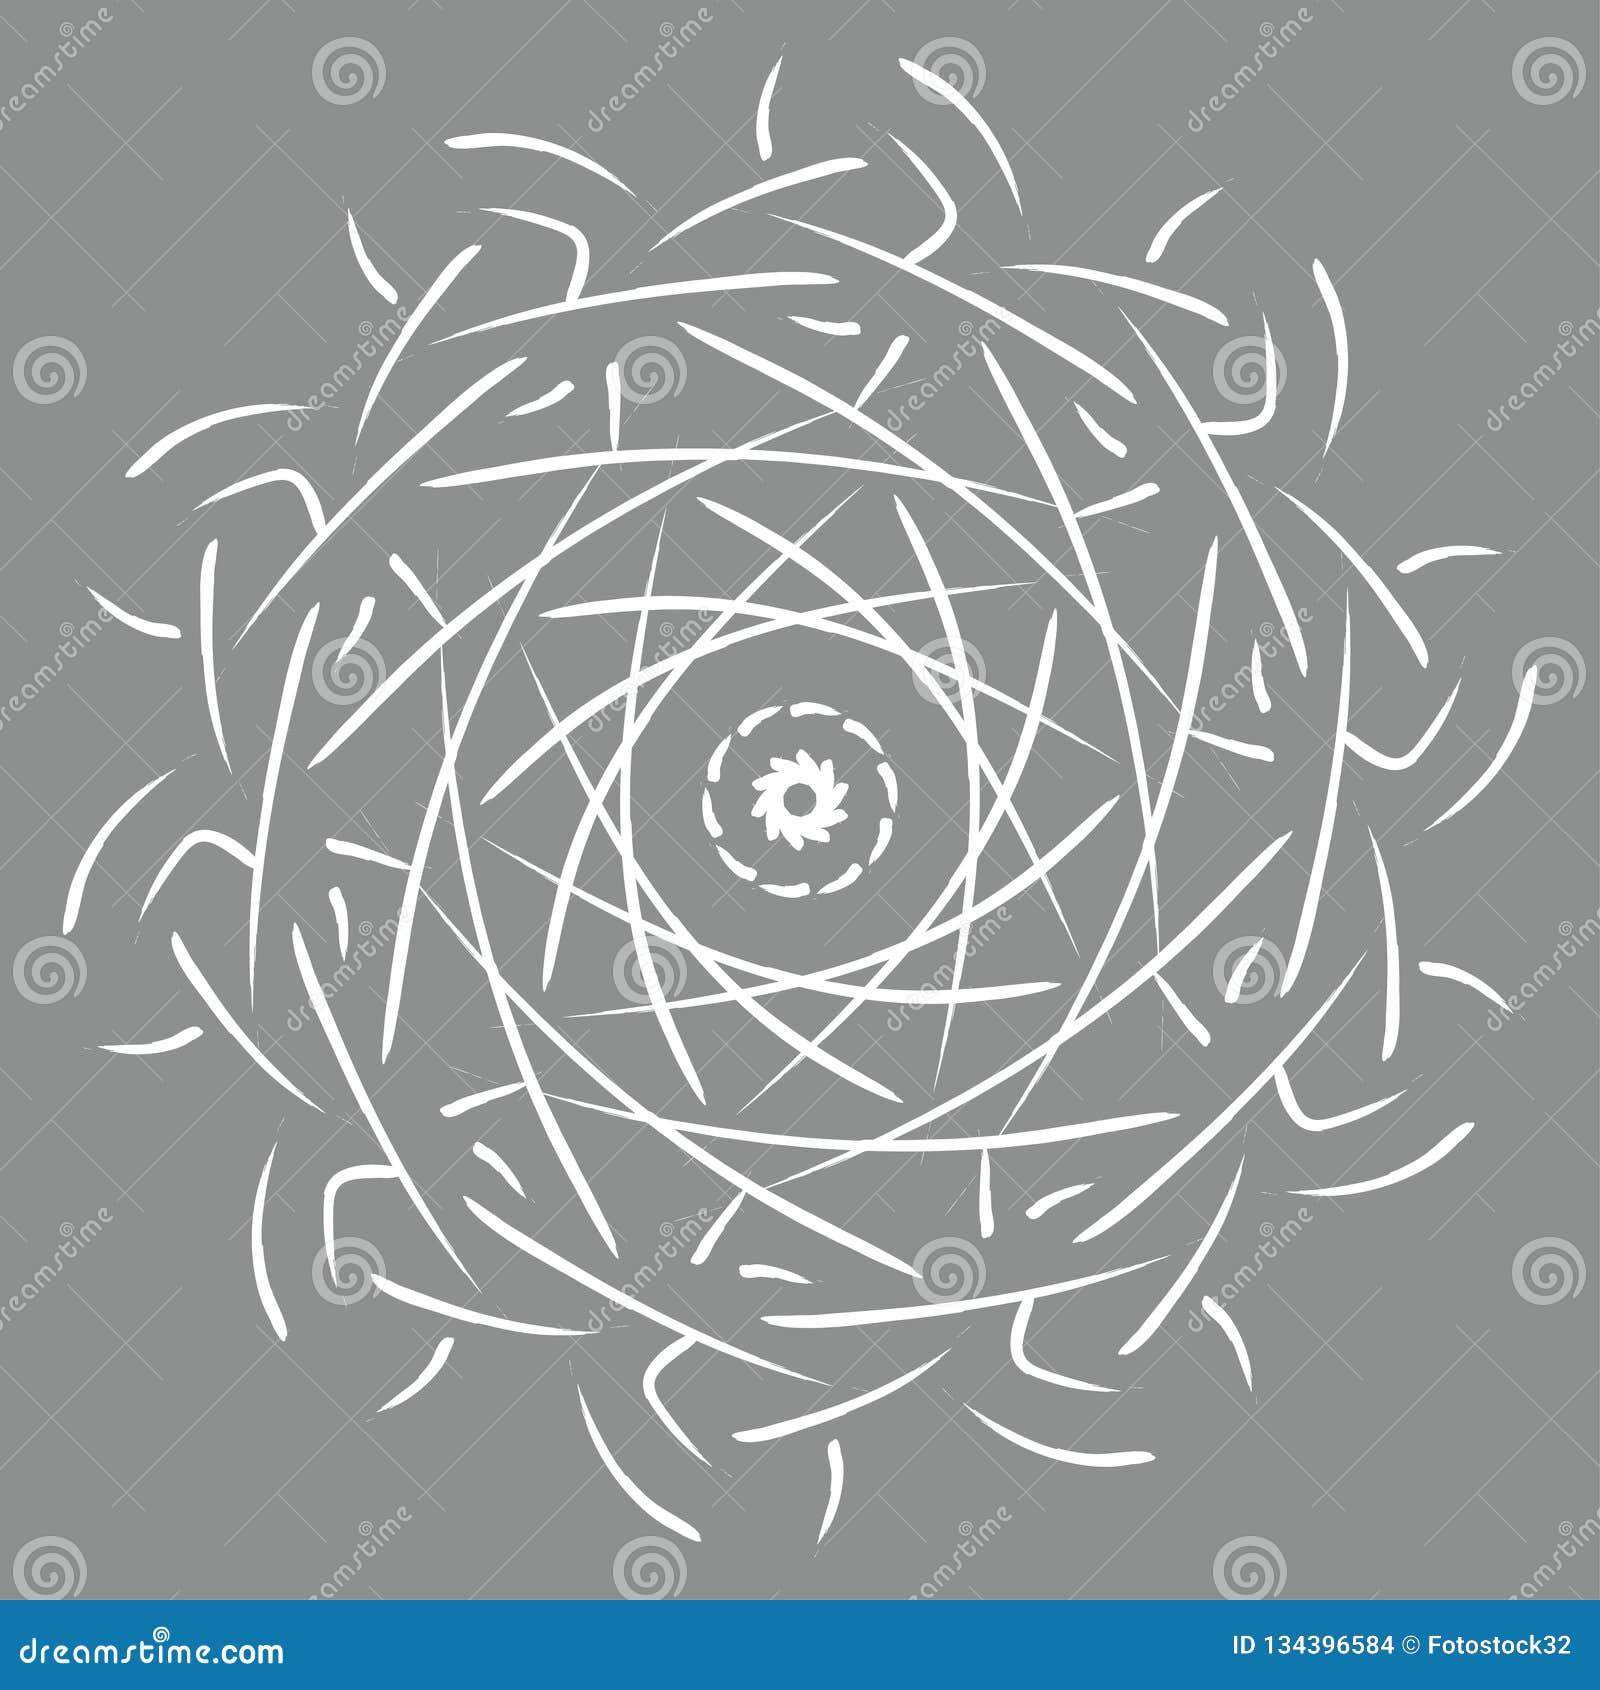 Mandala vector illustration. Round abstract floral oriental pattern, vintage decorative elements